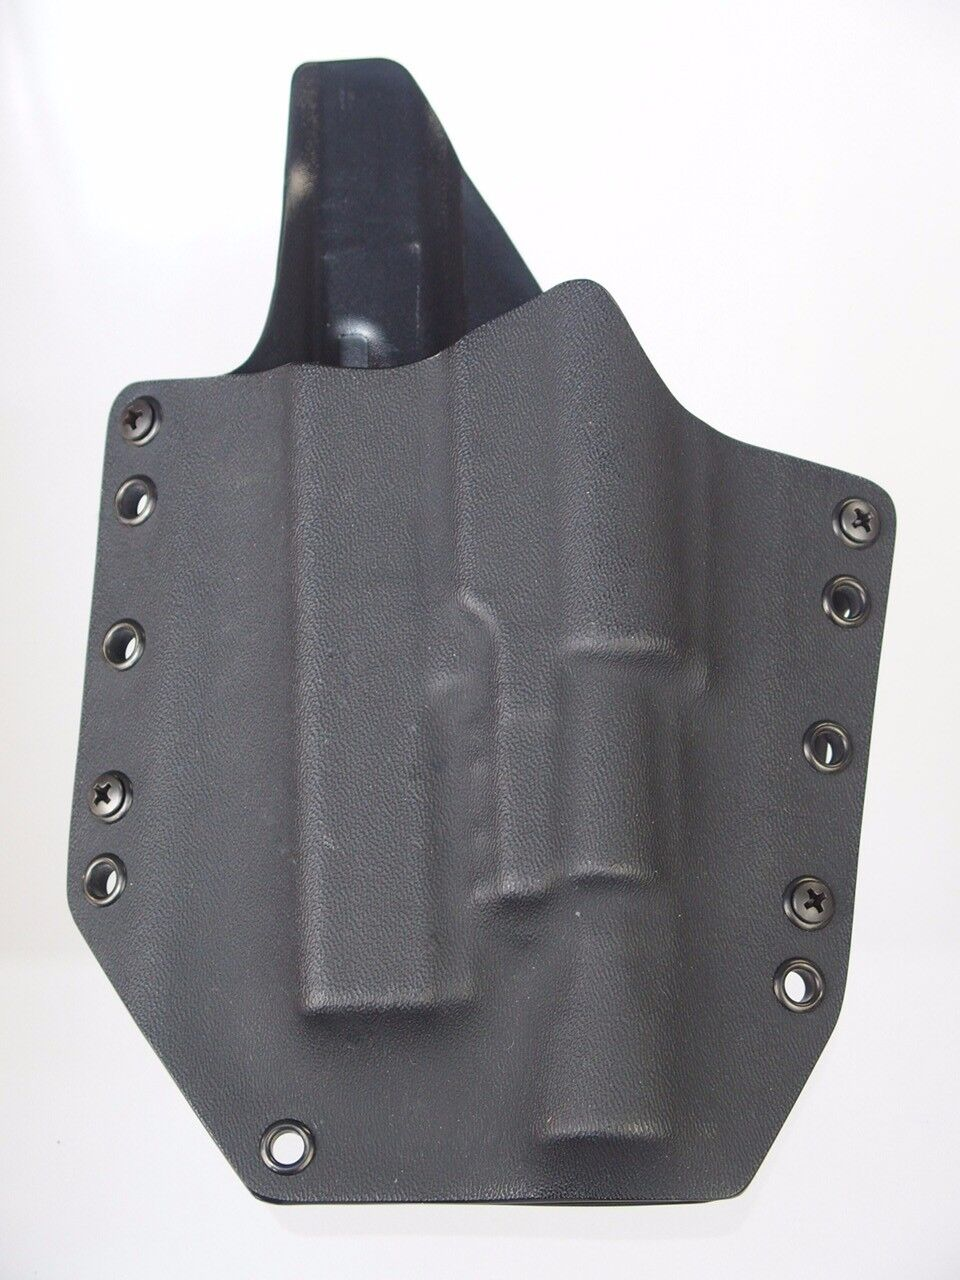 Escudo de la izquierda Raven Completo Pistolera Para Glock 20 21 semper-fi Surefire X300 Ultra un